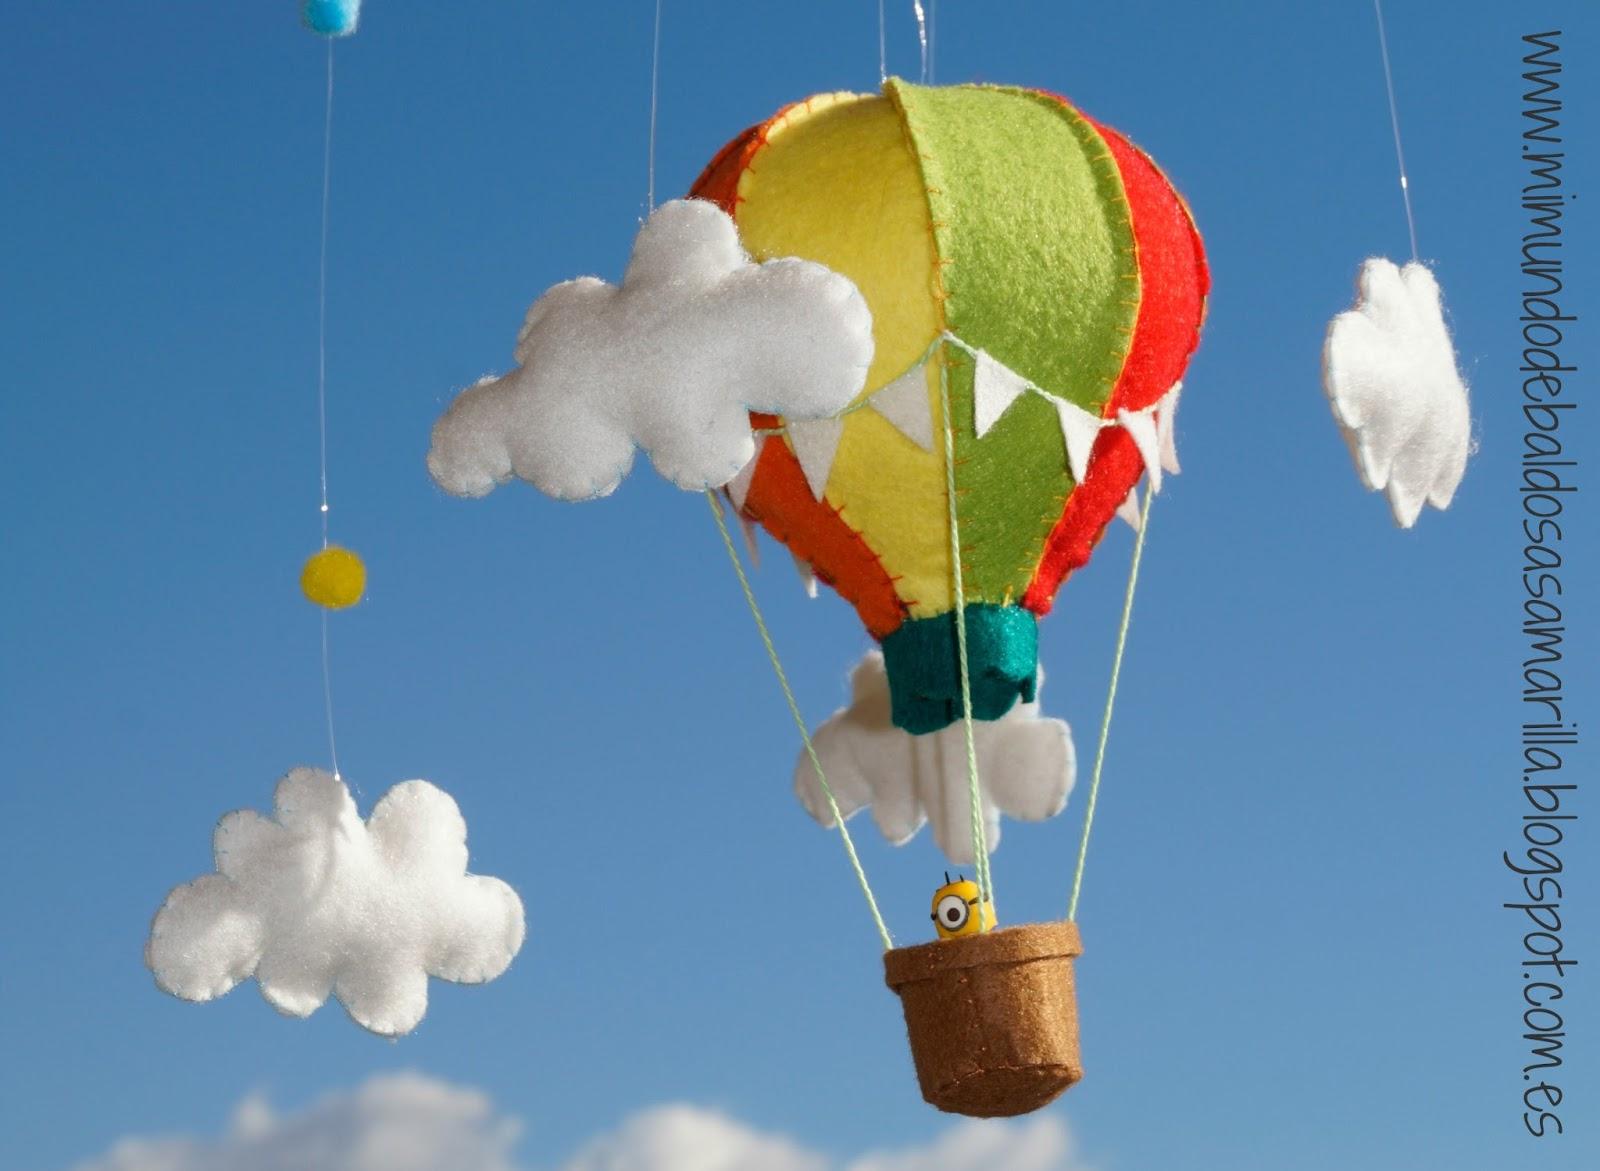 Mi mundo de baldosas amarillas un globo aerost tico para - Globos aerostaticos infantiles ...